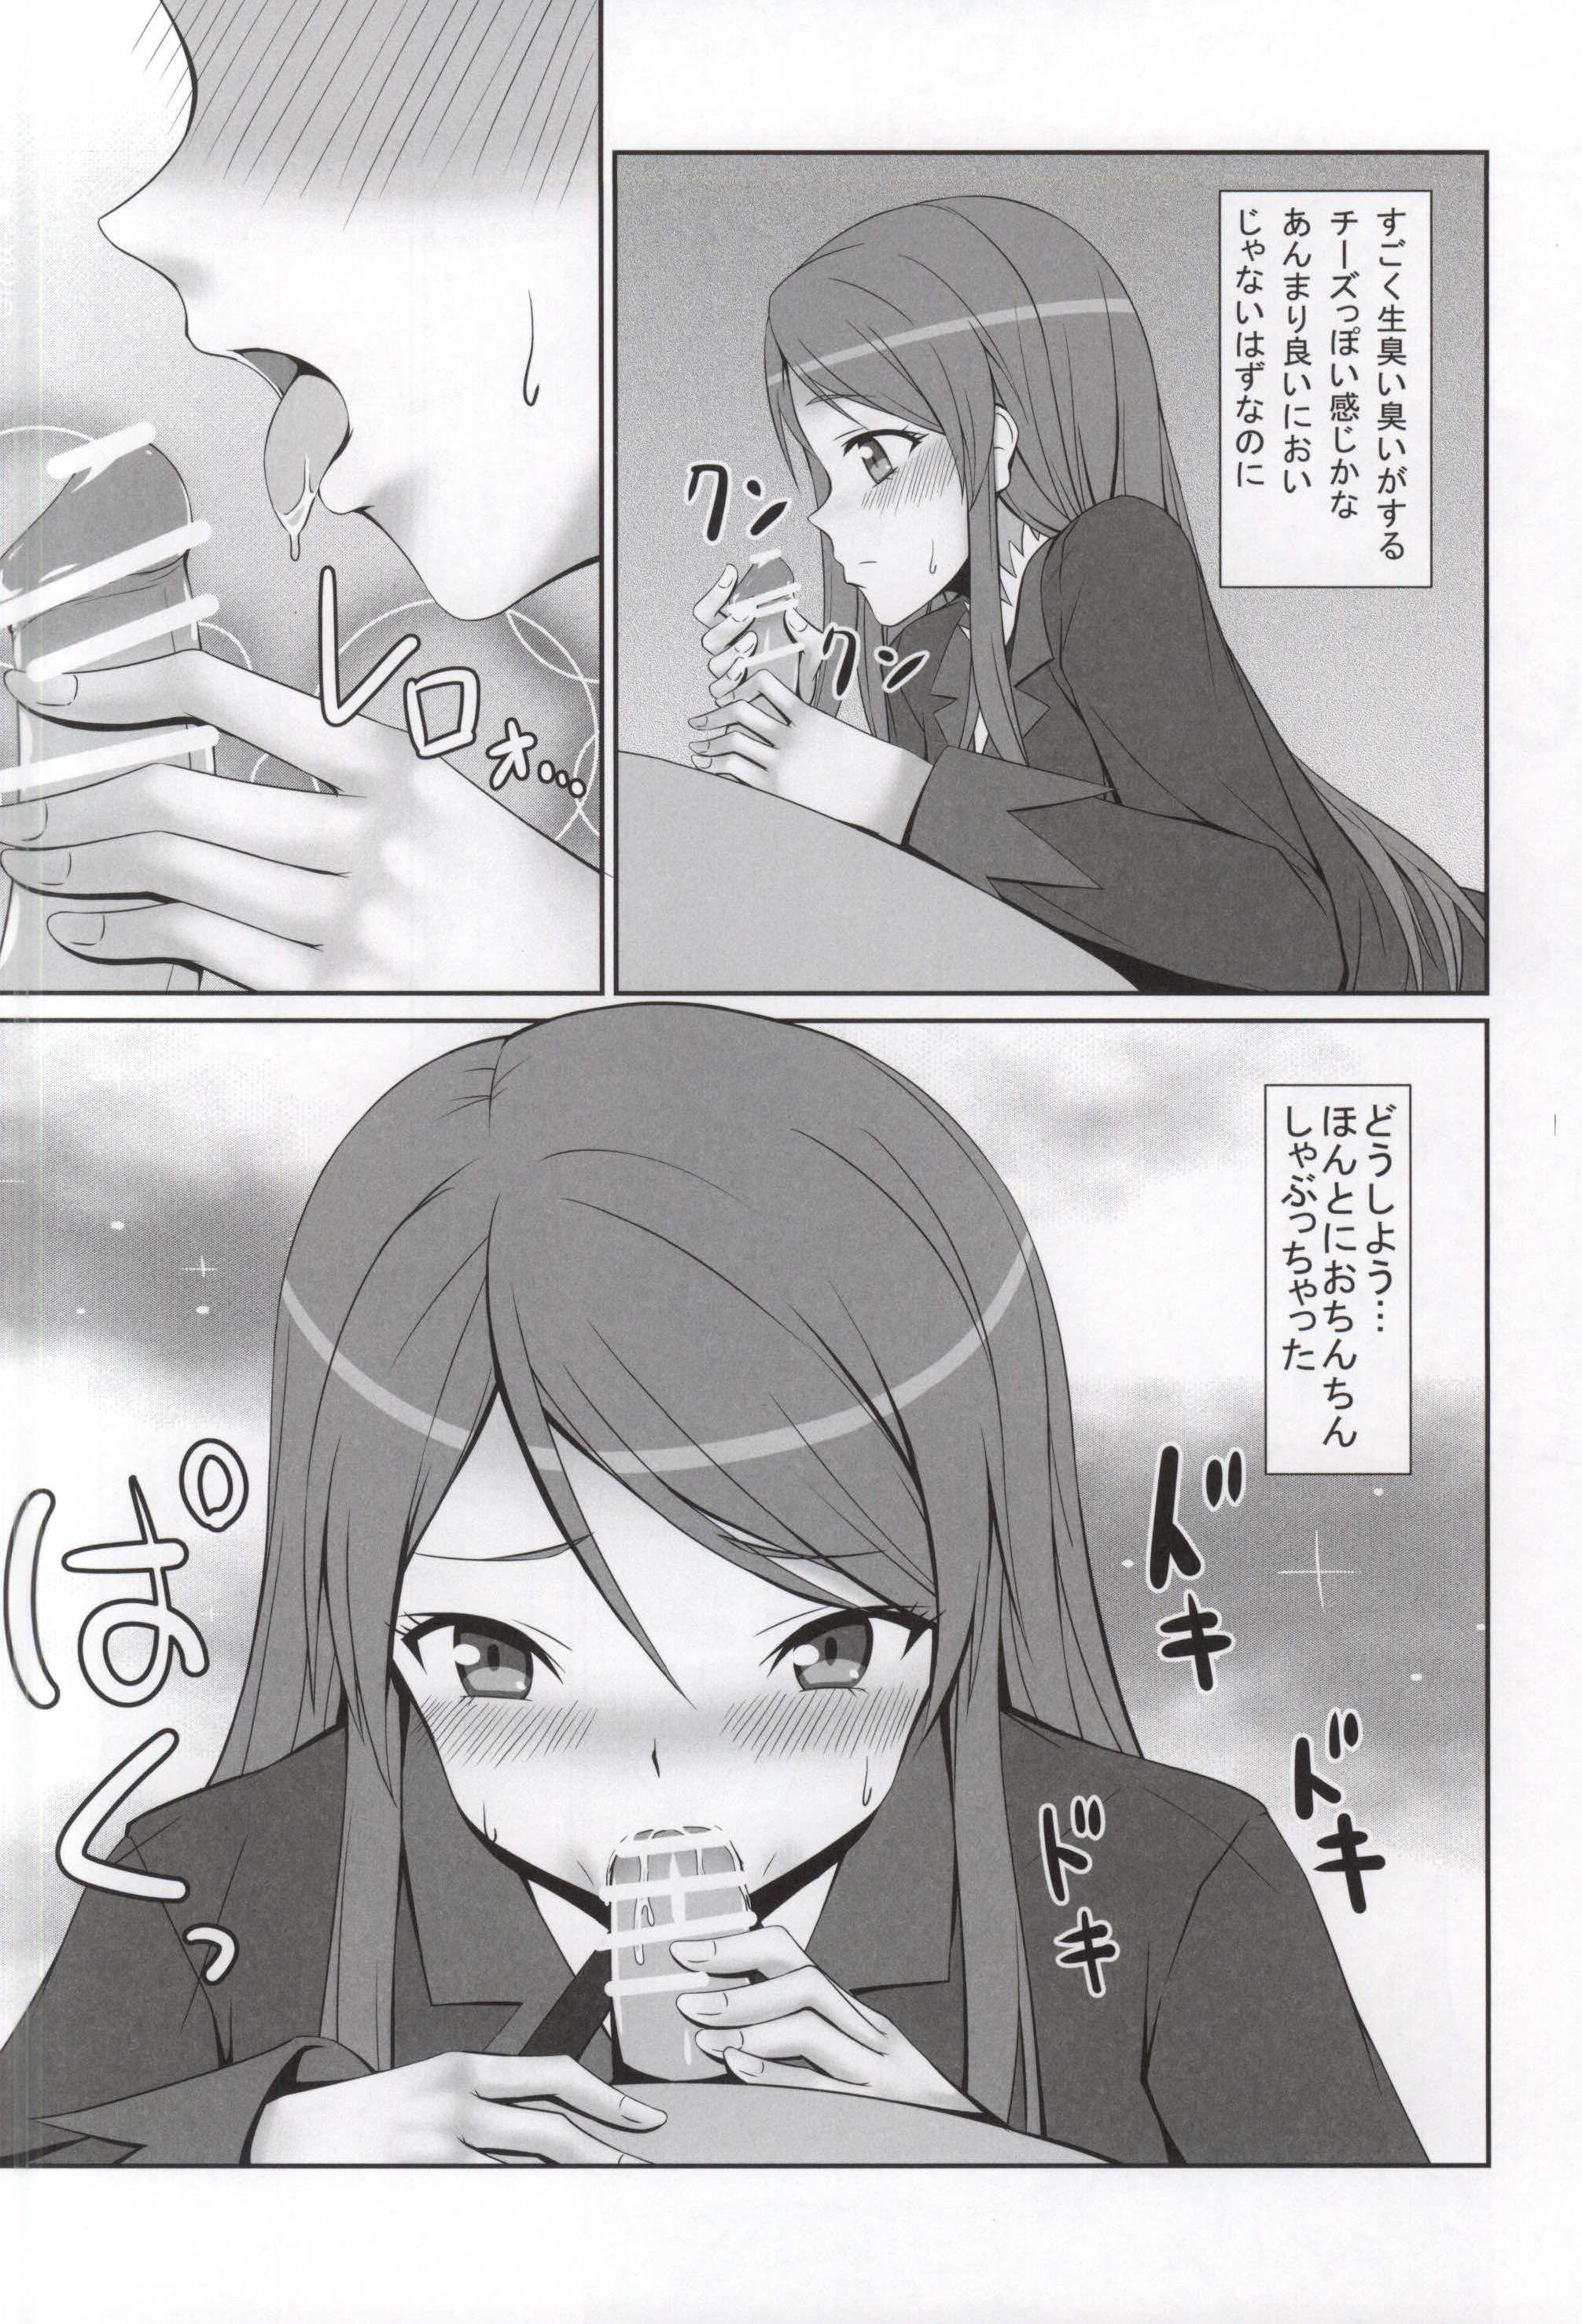 Ran-chan to Ebipon! 4